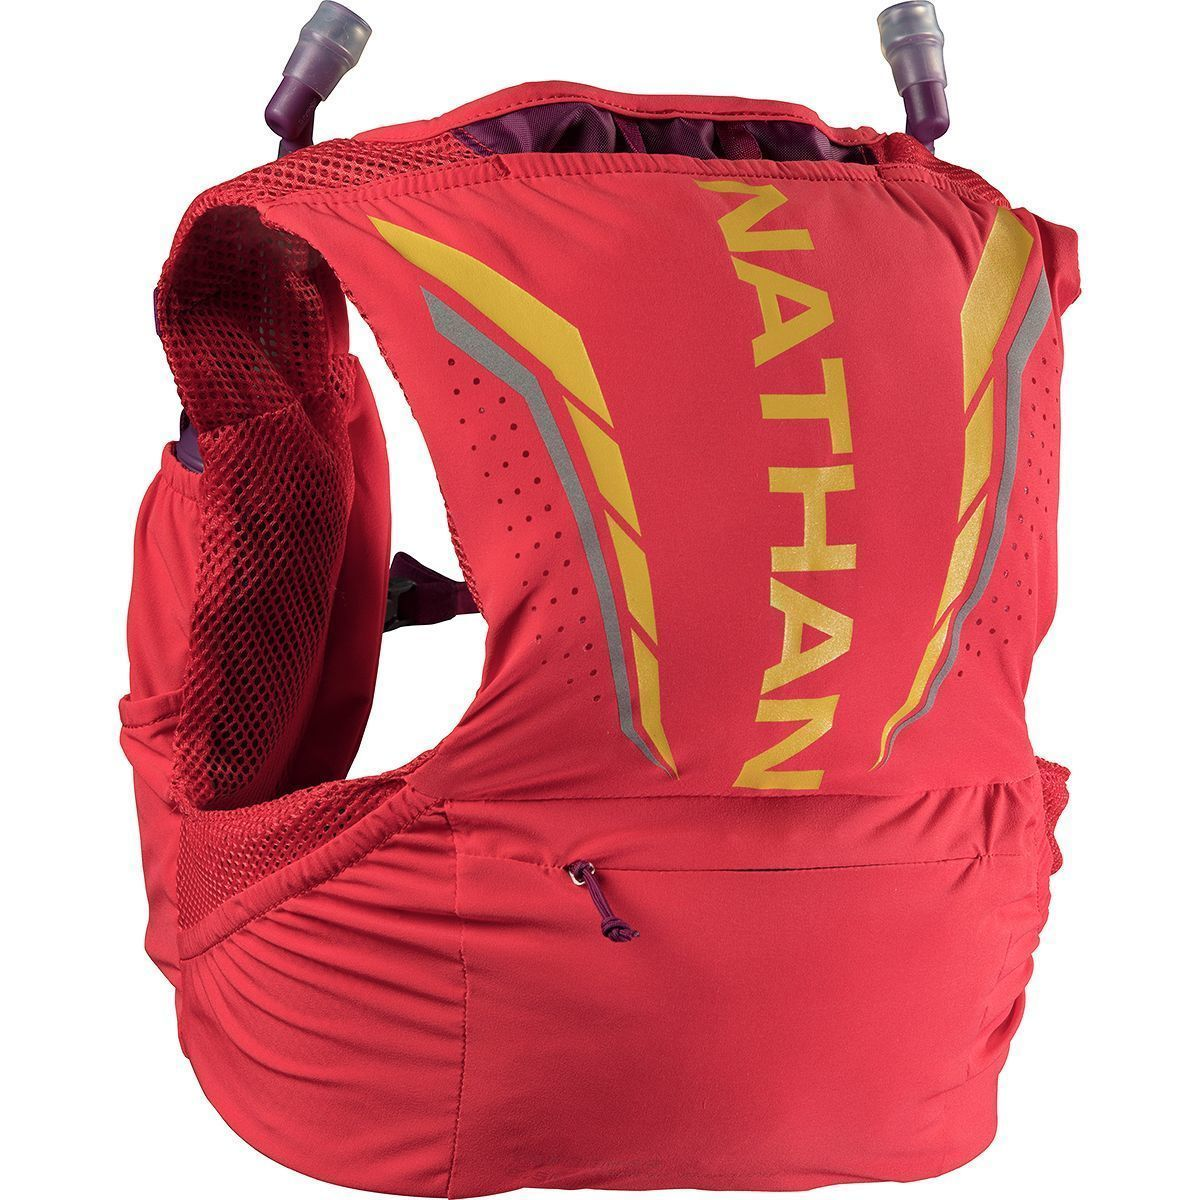 Nathan VaporMag 2.5L Race Vest